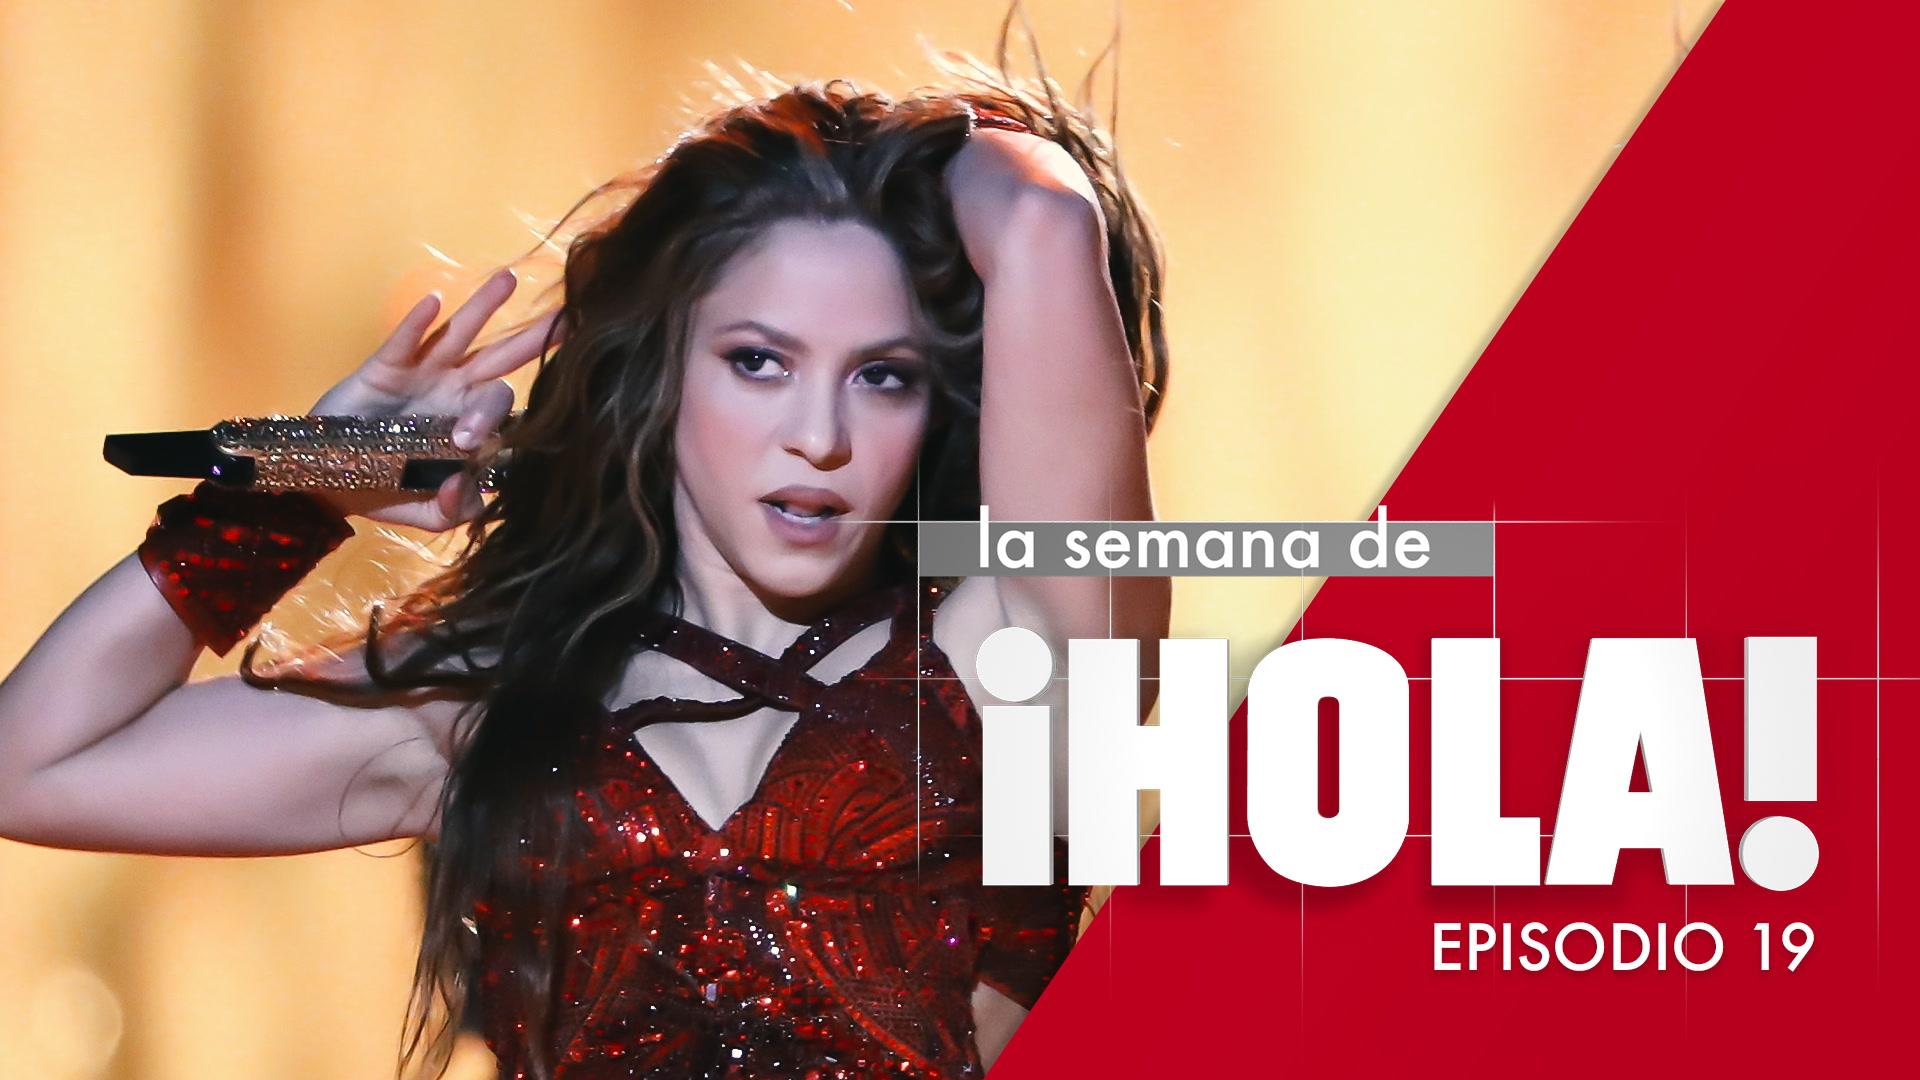 La semana de ¡HOLA! - Episodio 19